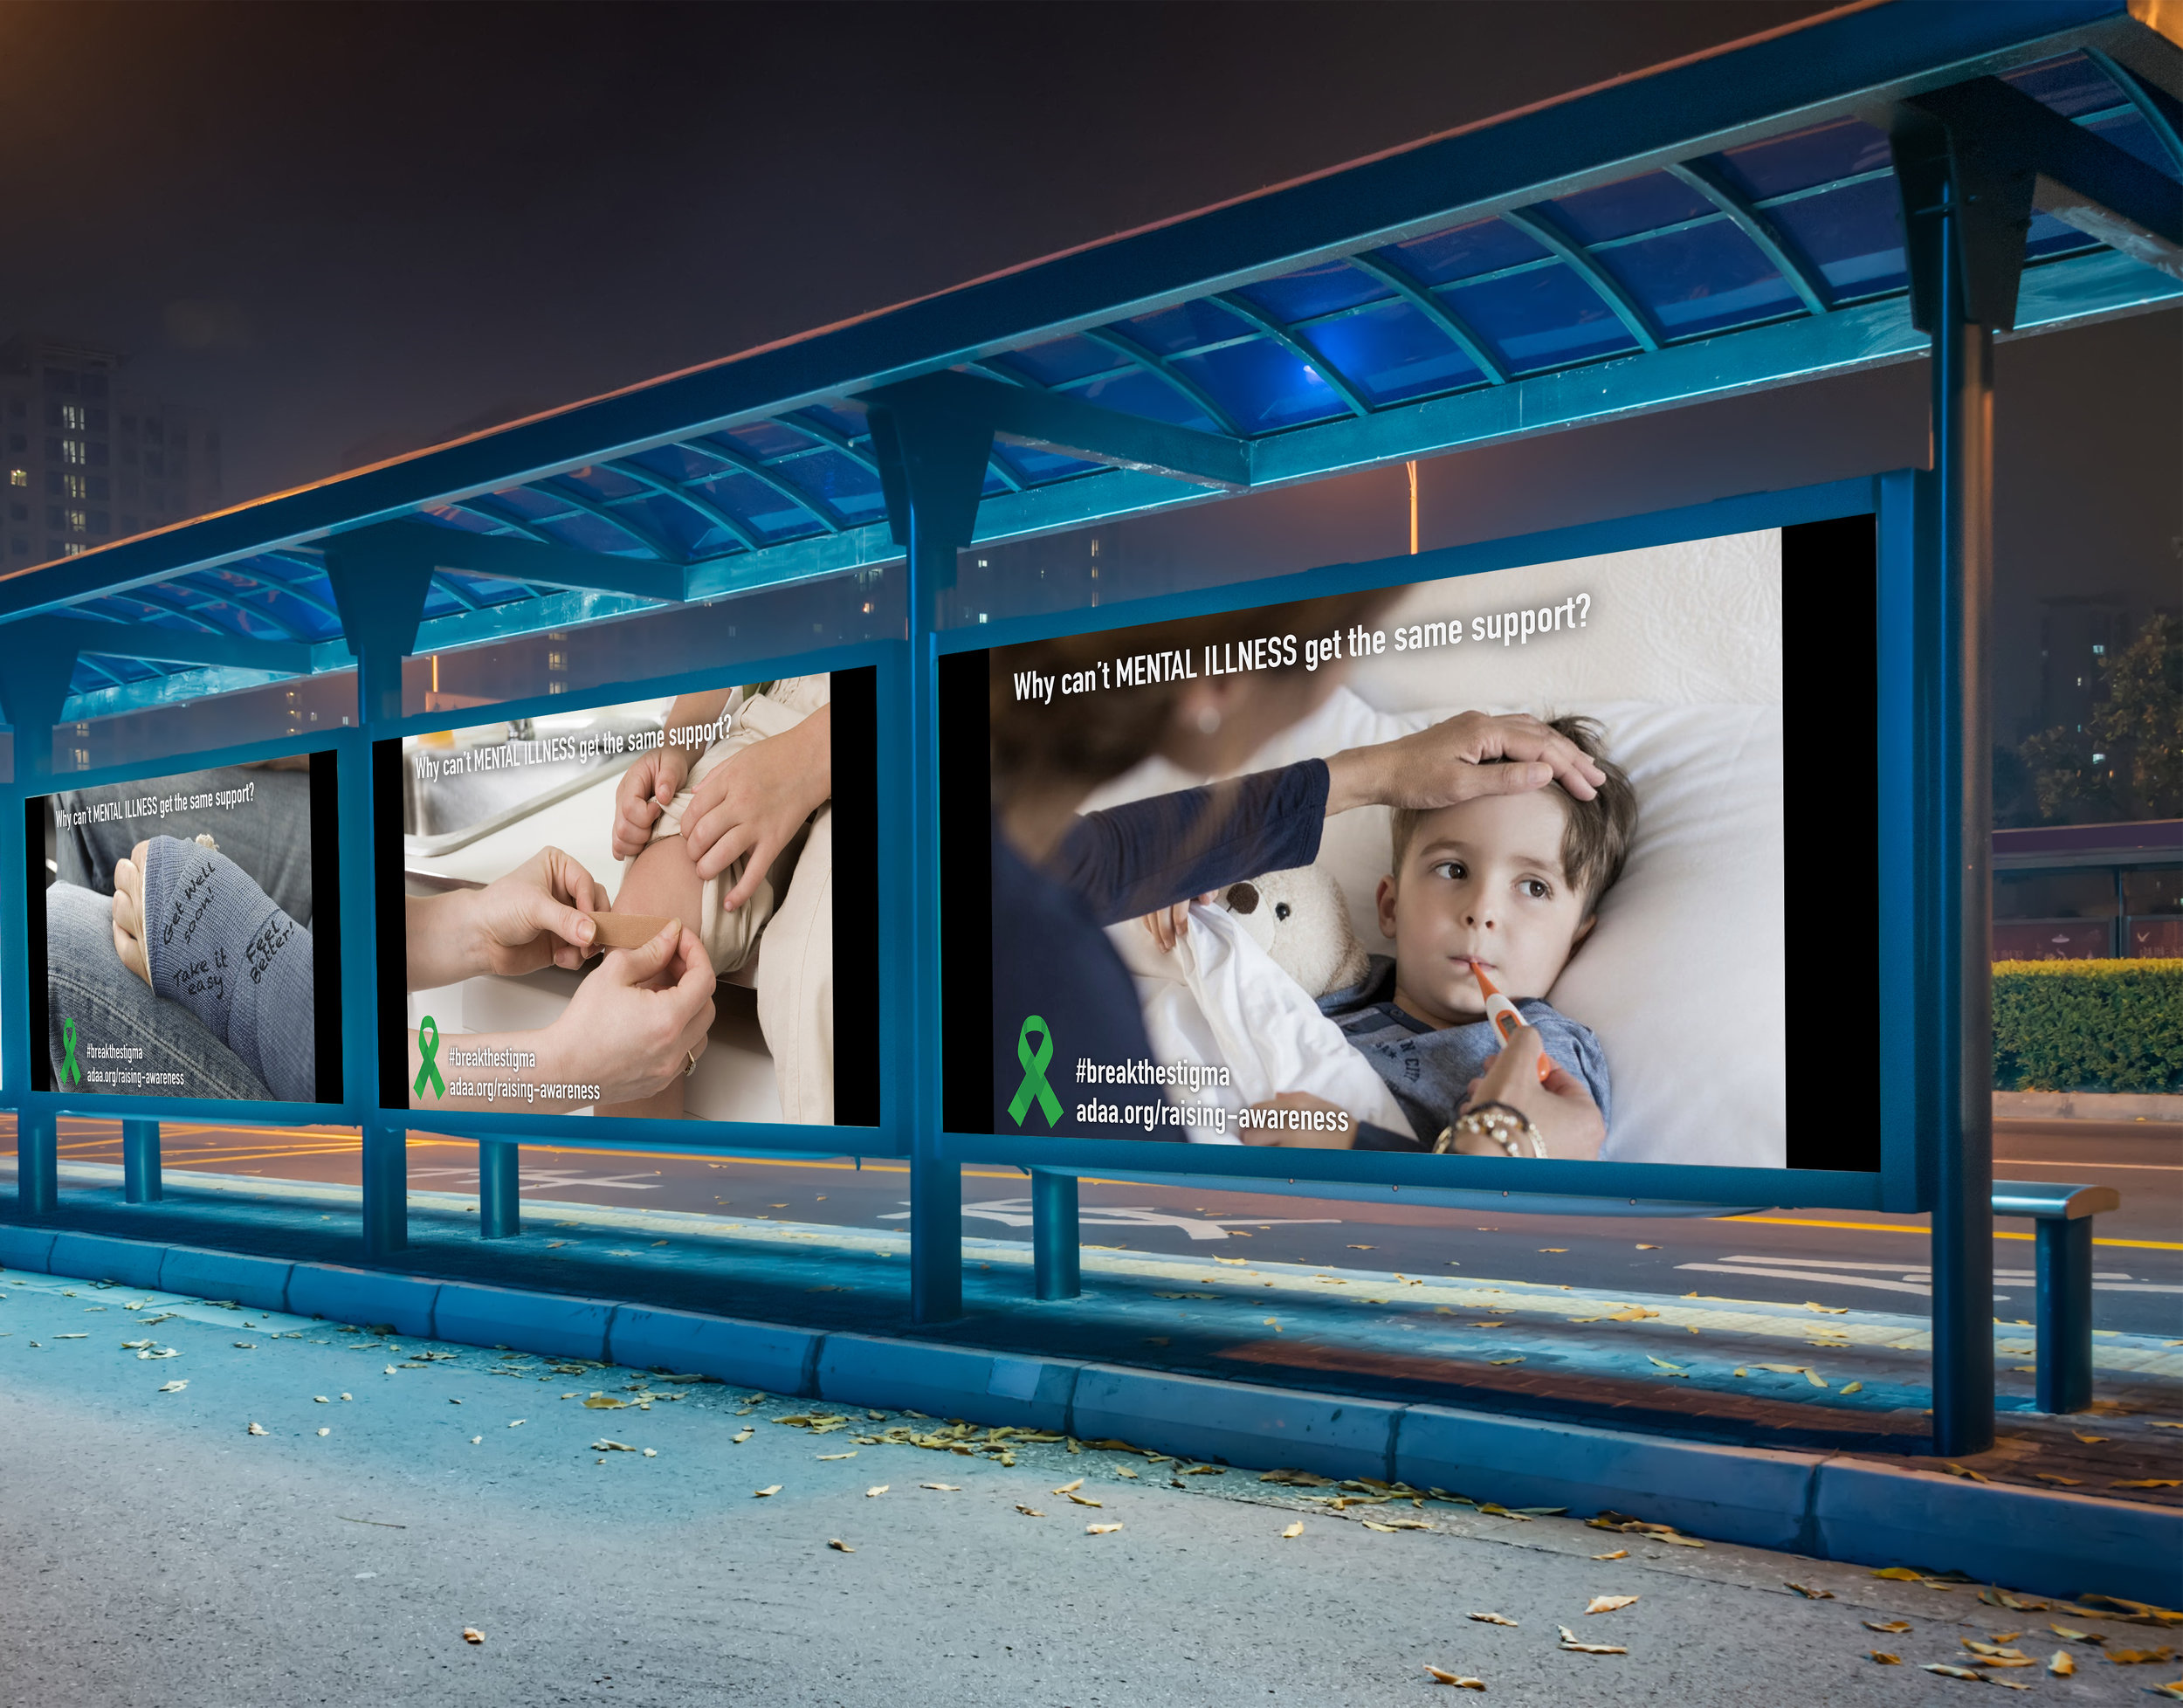 Bus-Stop-Billboard-Mockup-PSD.jpg